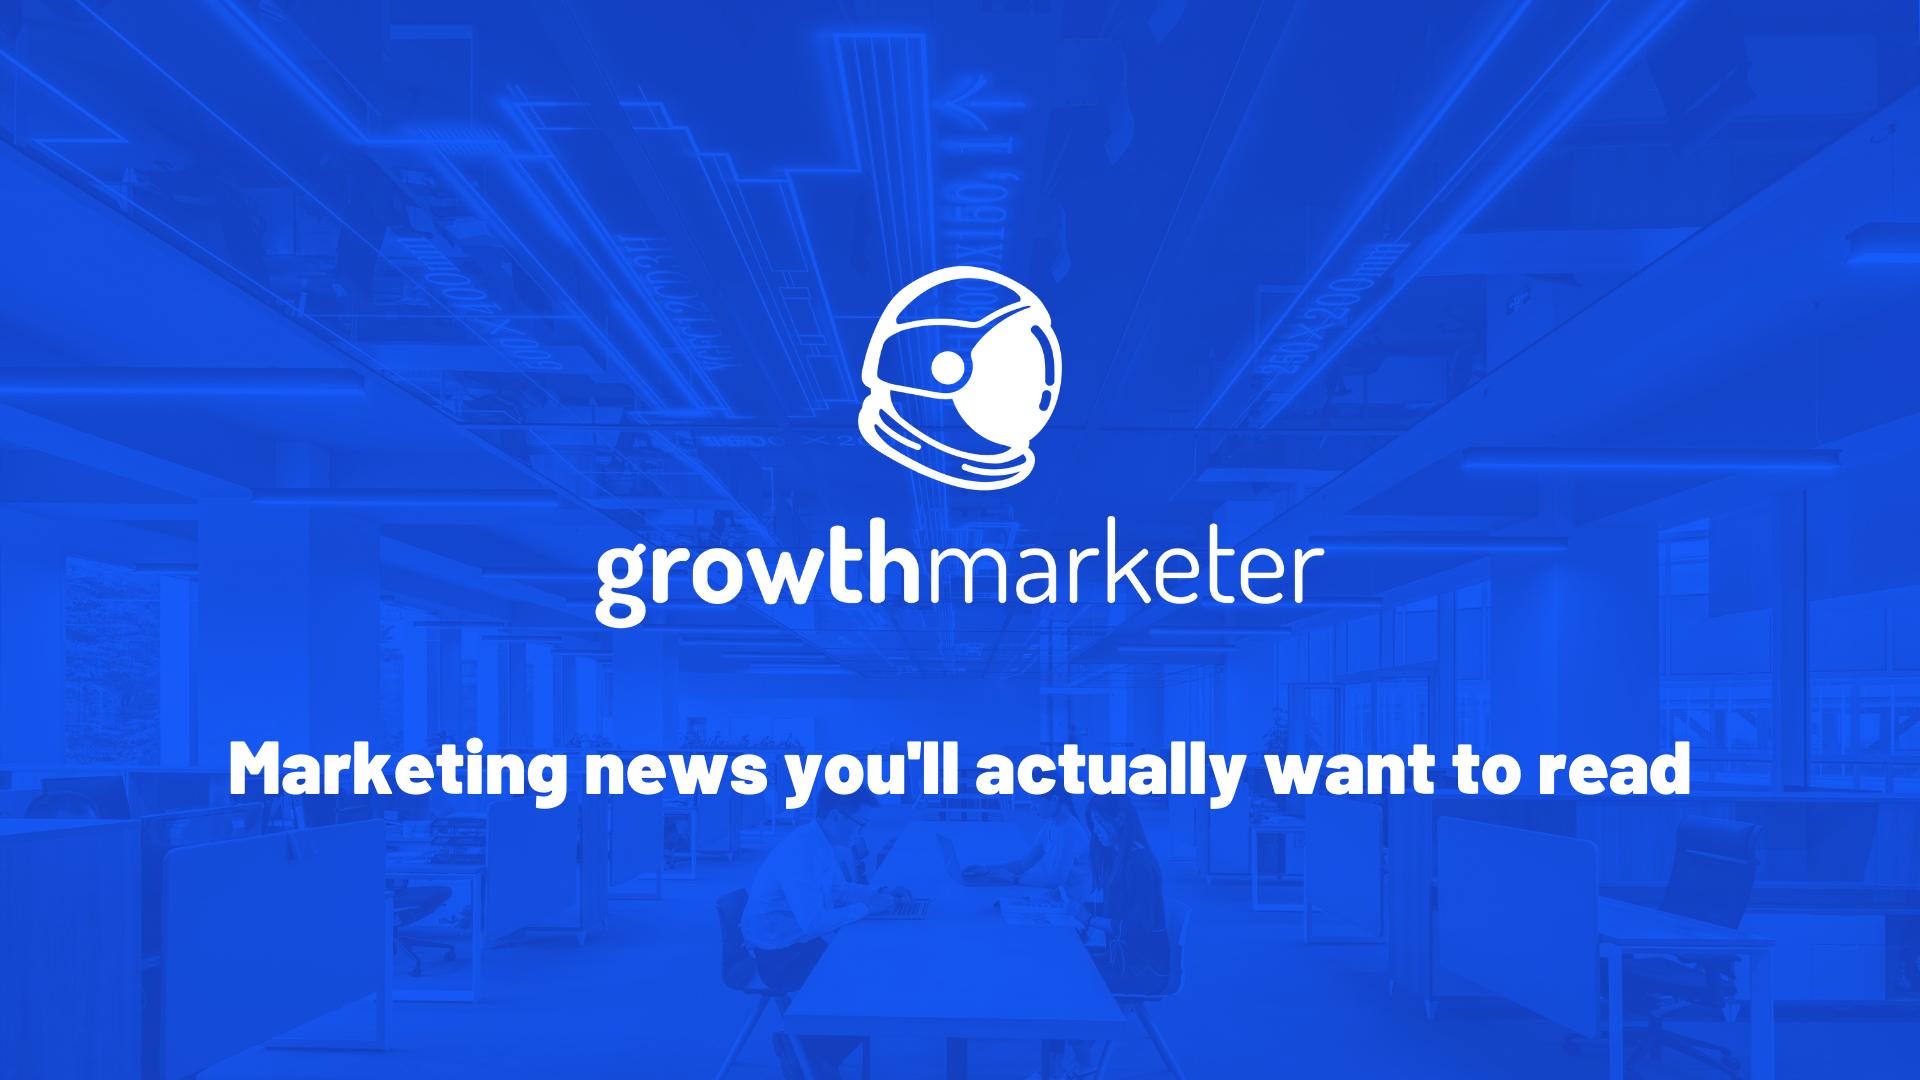 Growth Marketer